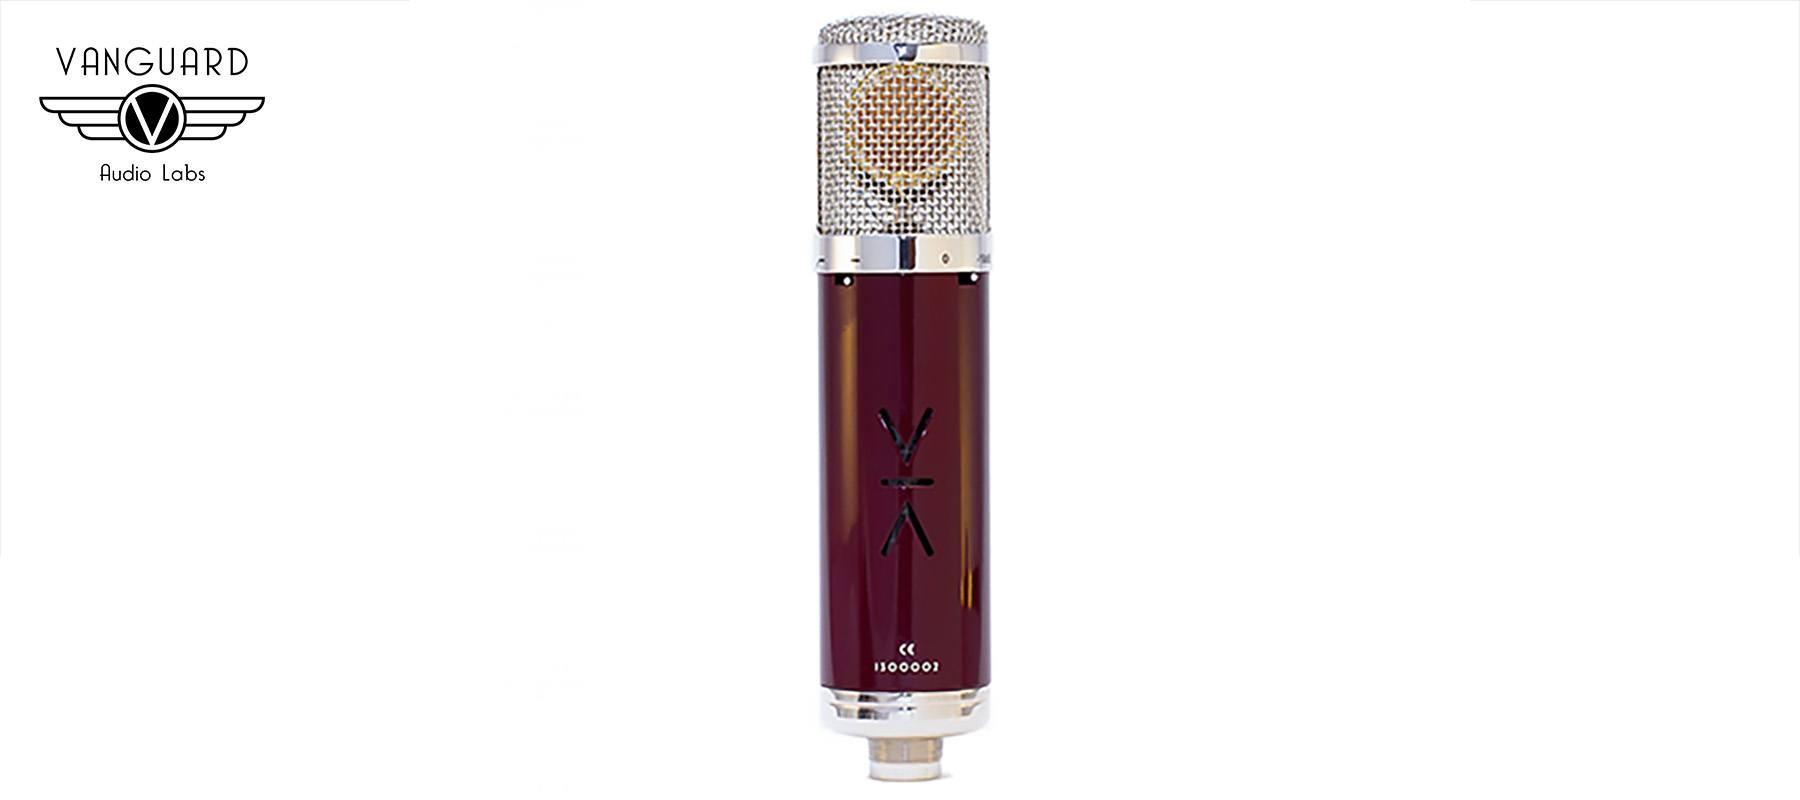 Vanguard Audio V13 - Arrière